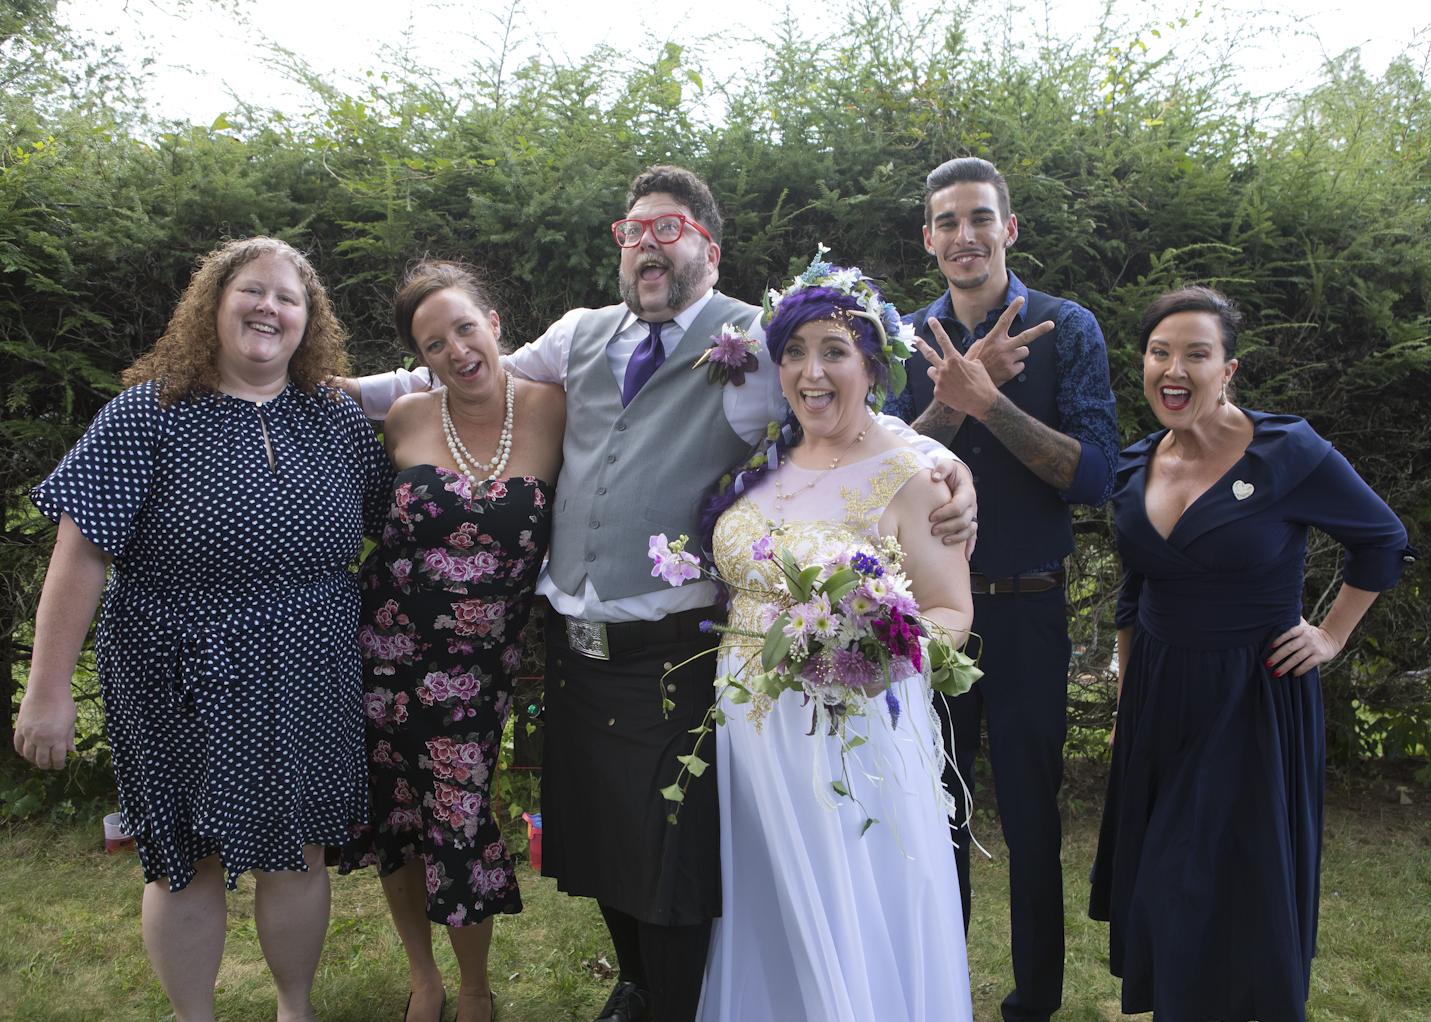 Tina and Adam wedding_Studio Misha Wedding Photography Asheville Photographer and Videographer00092.JPG